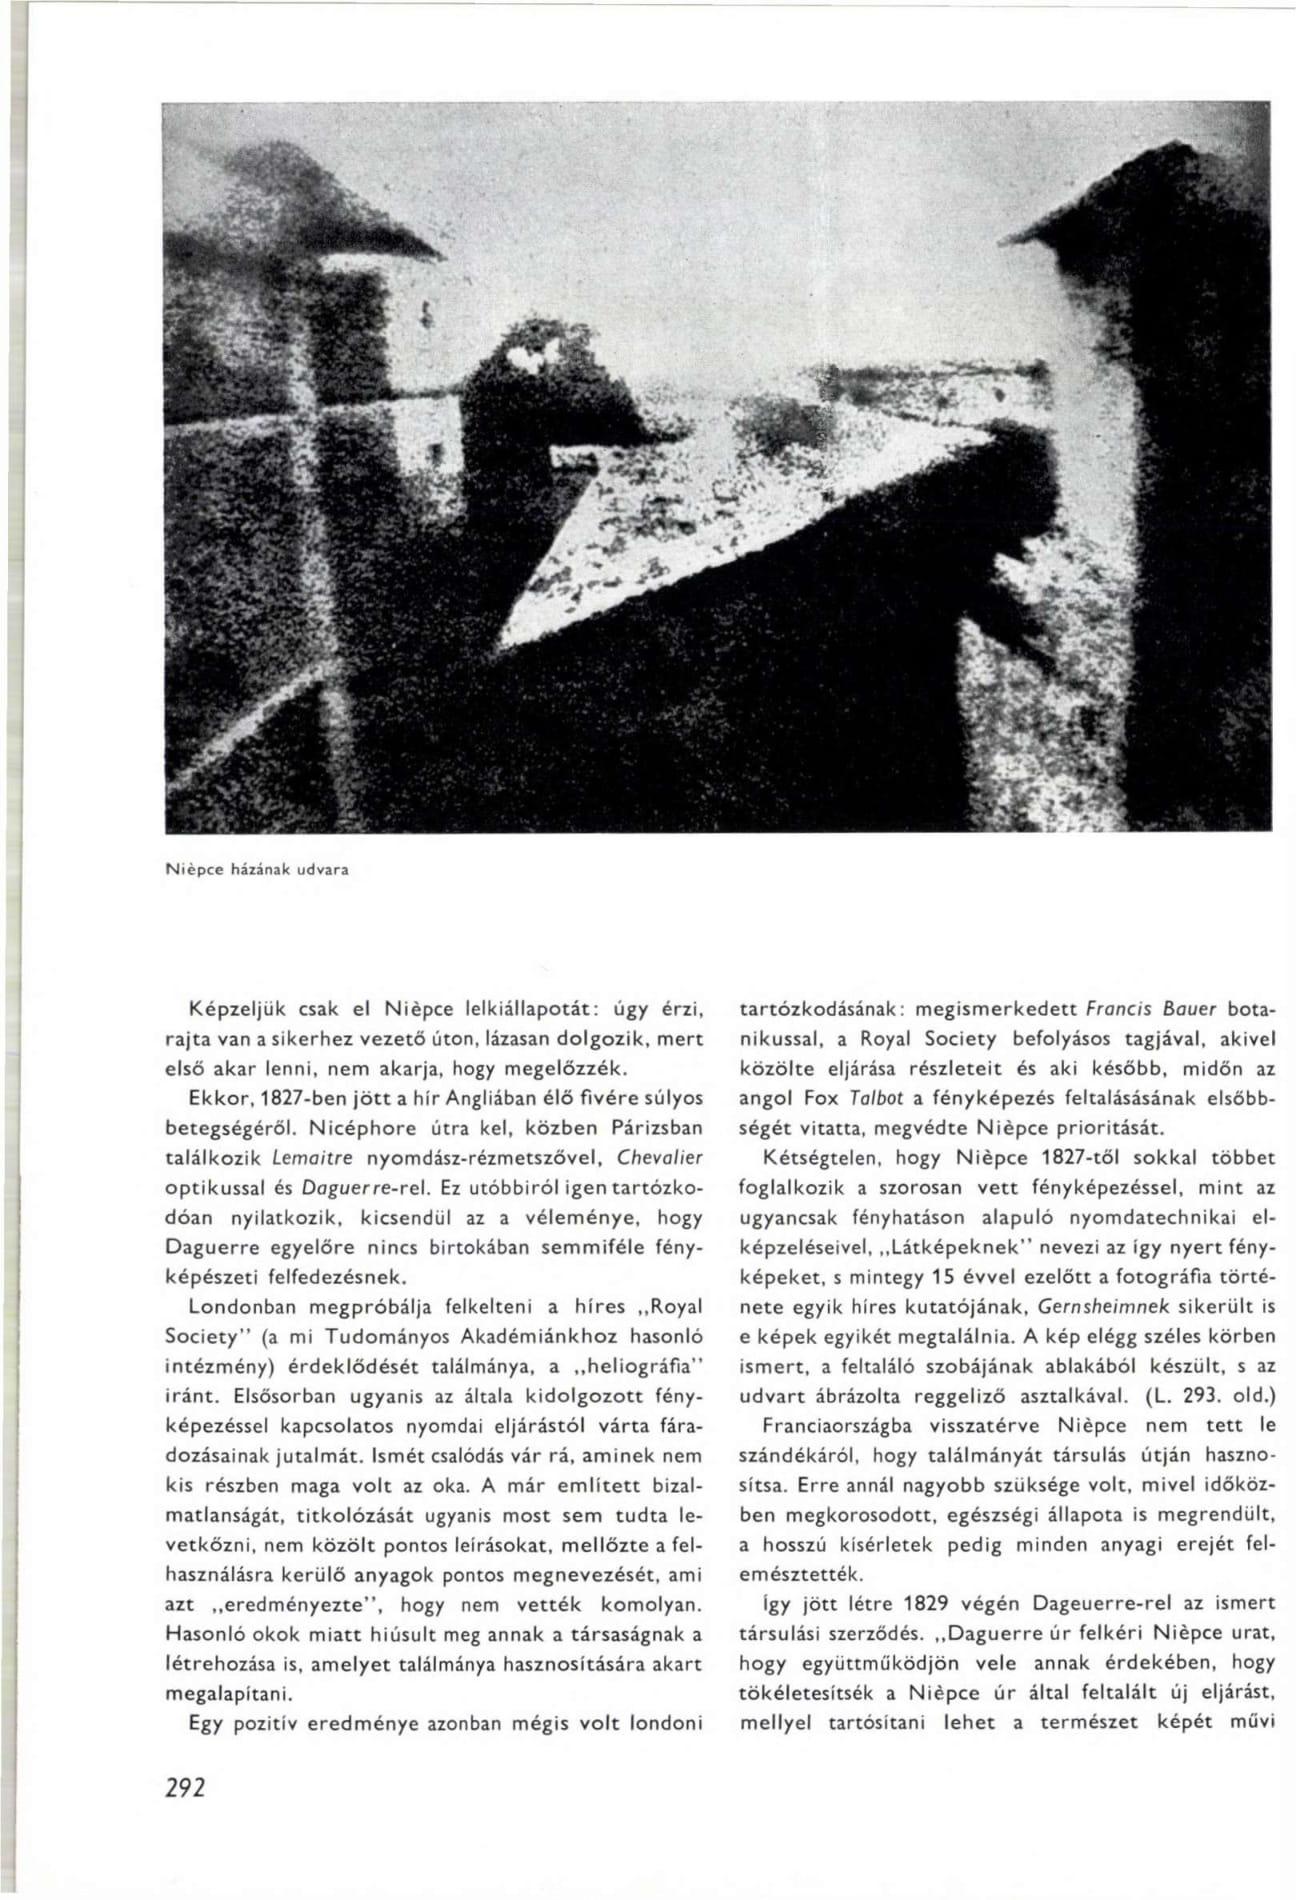 Foto, XIII. évfolyam, 1966. július<br />292. o.<br /><br />forrás: arcanum.hu